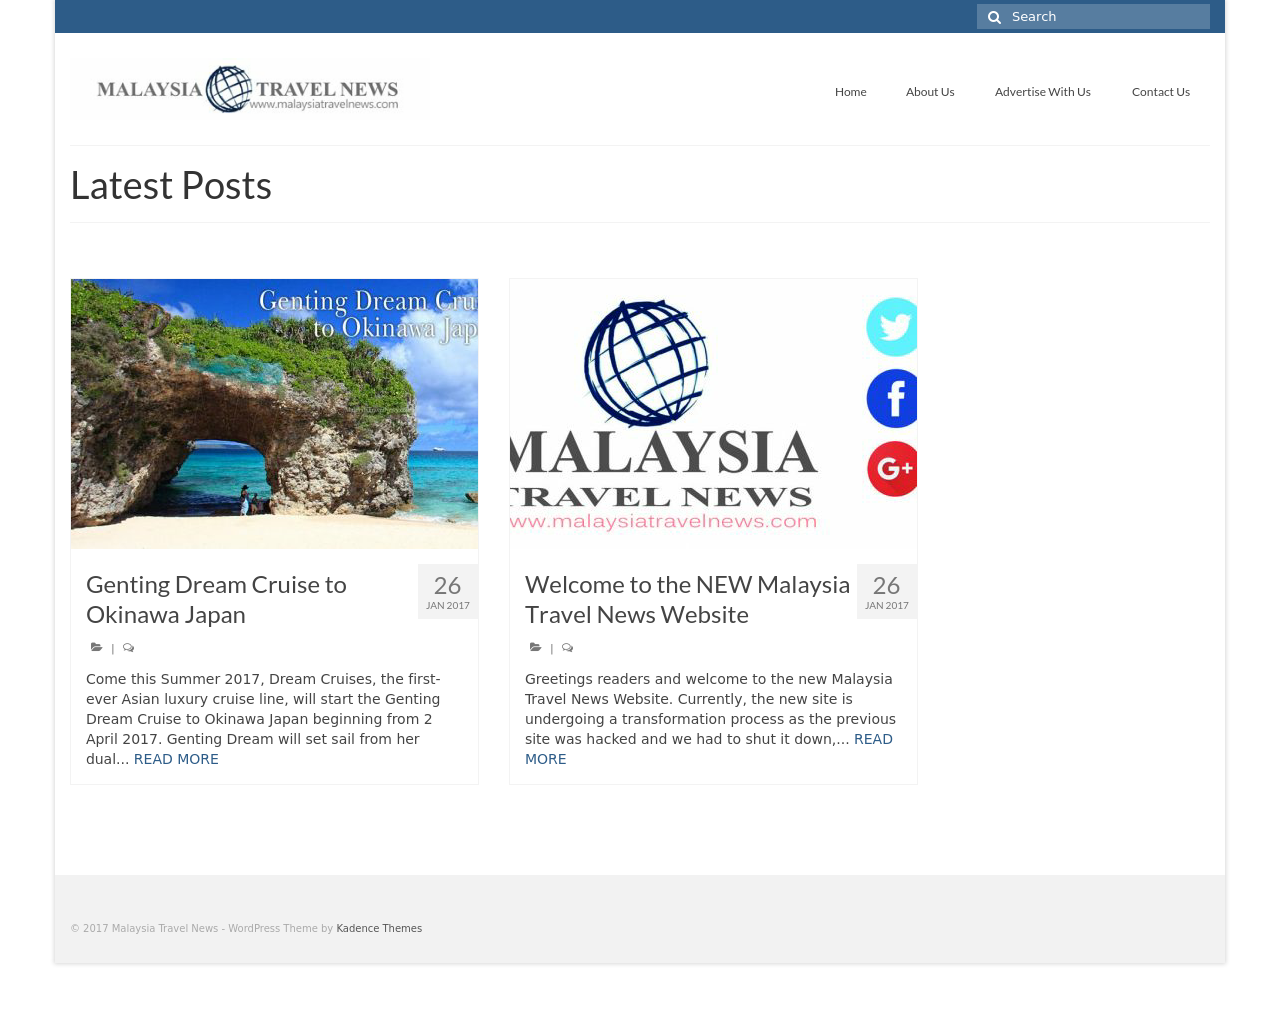 Malaysia-Travel-News-Advertising-Reviews-Pricing